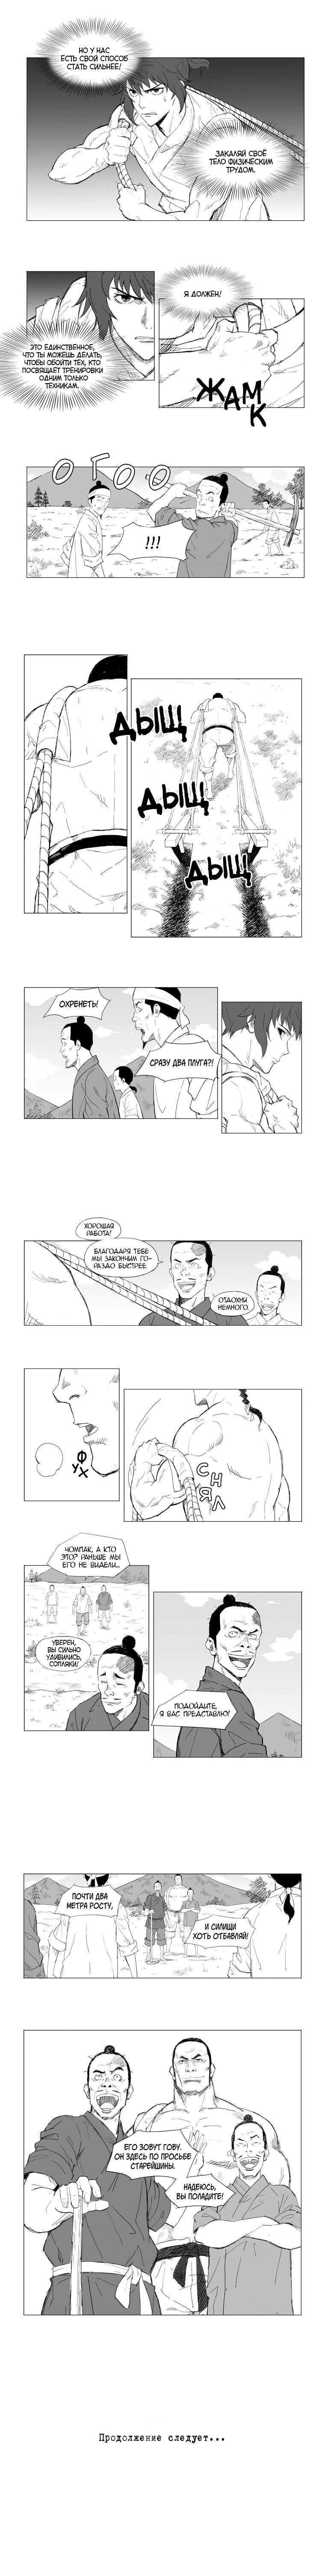 https://r1.ninemanga.com/comics/pic2/39/28263/285895/1456888233365.jpg Page 4